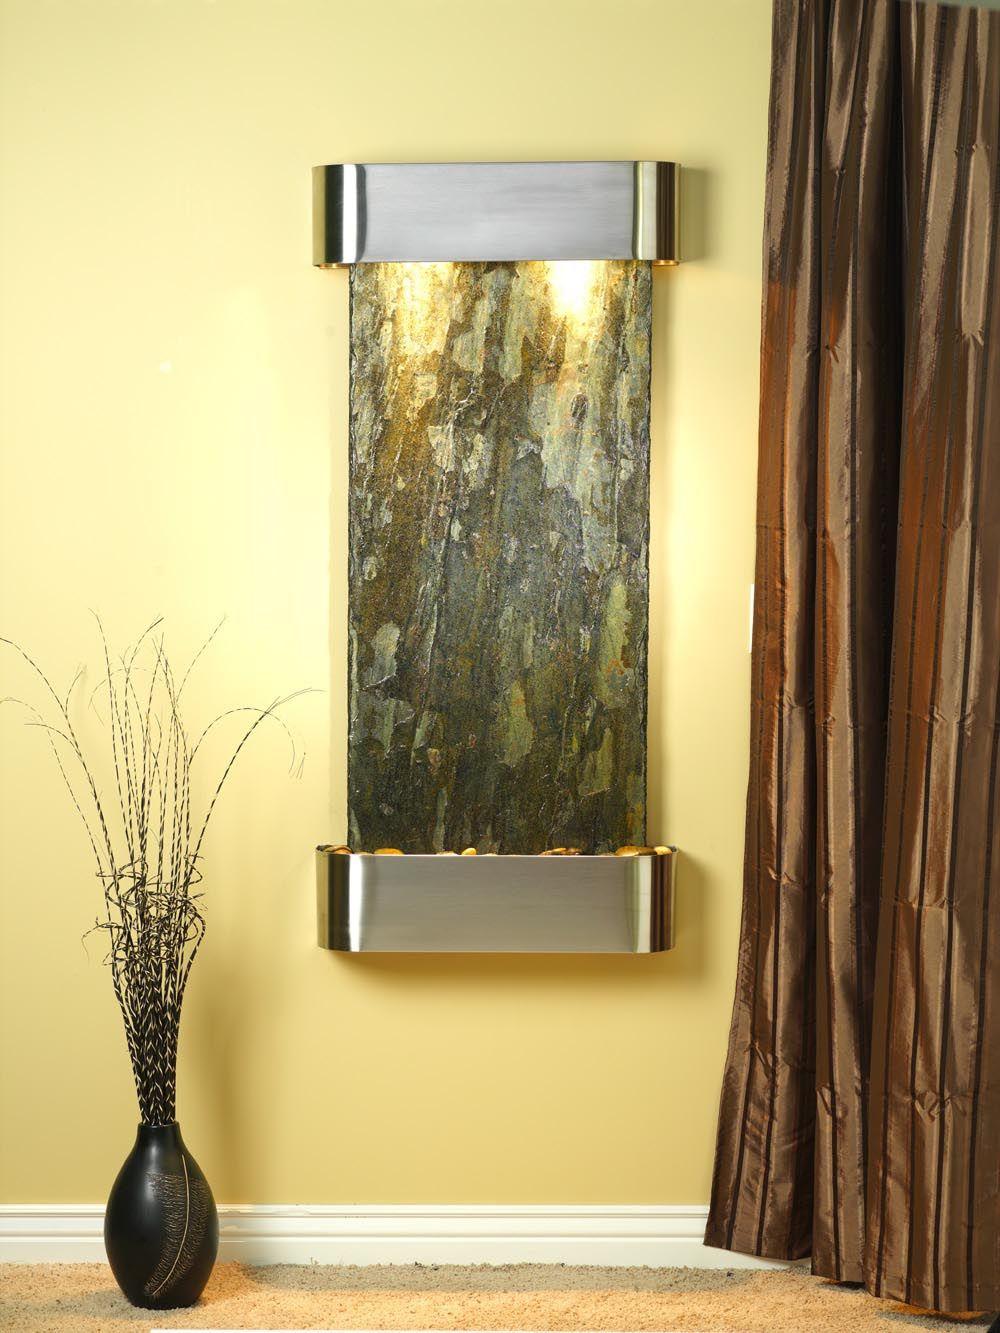 Indoor Wall Fountains | decorating ideas | Pinterest | Indoor wall ...